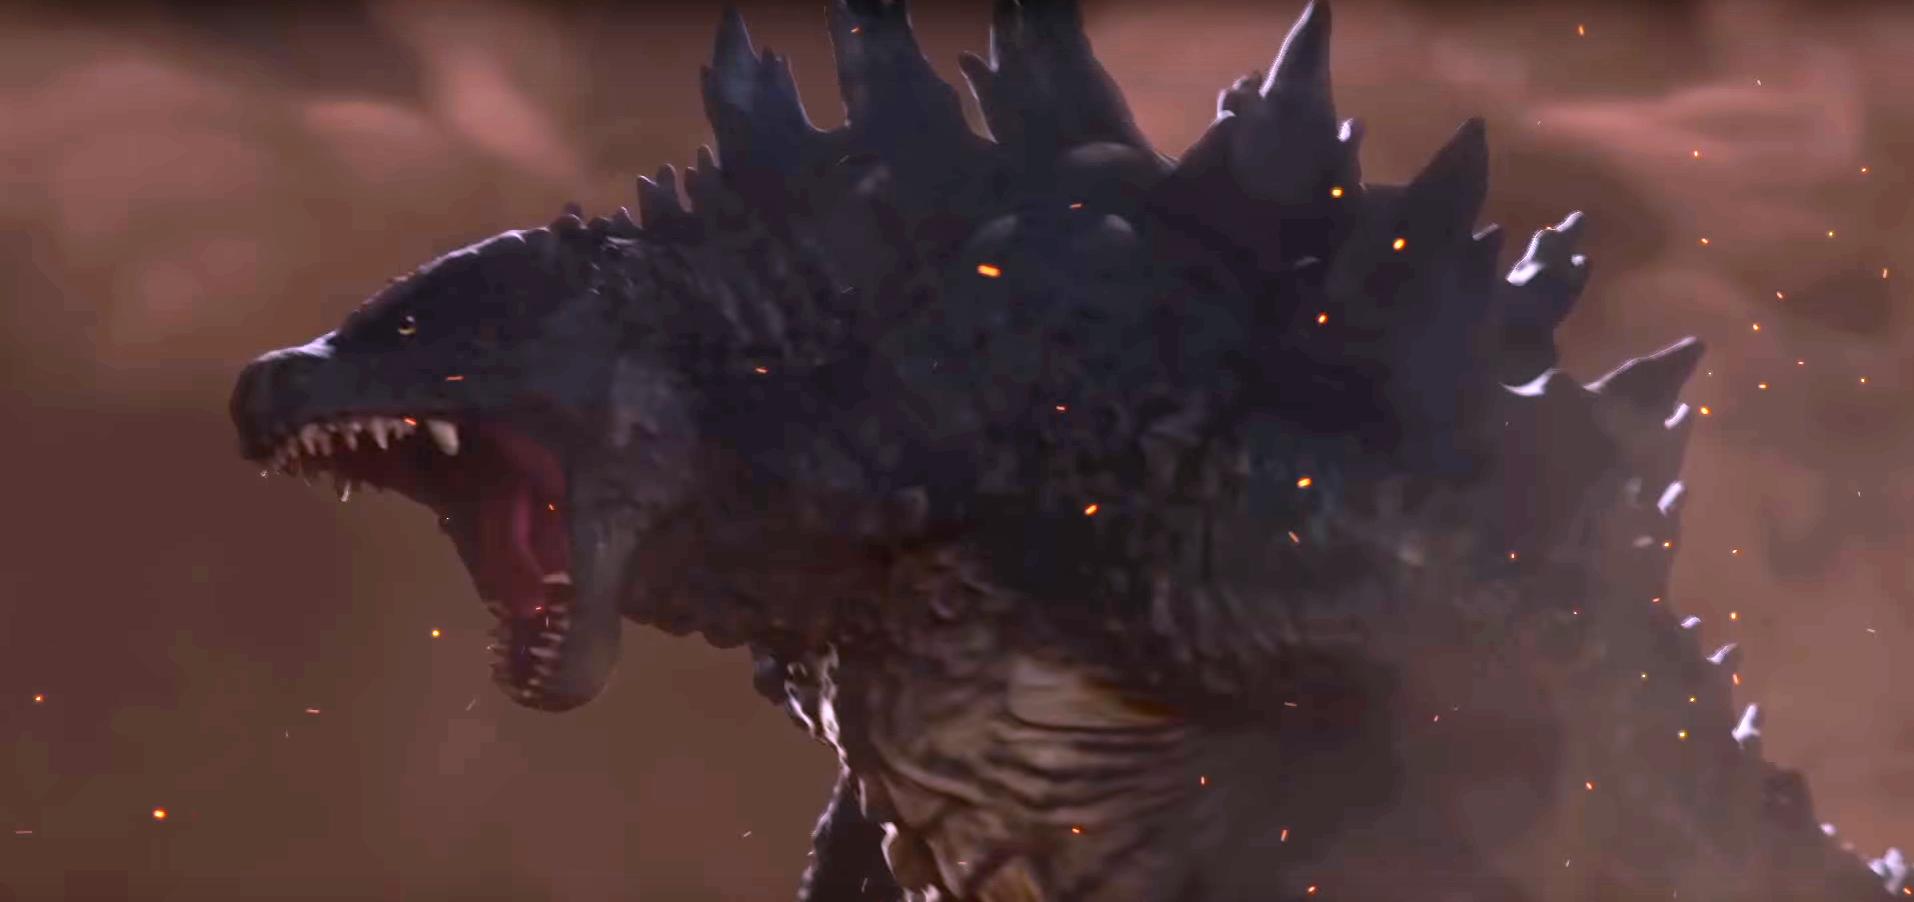 Godzilla 2014 form Godzilla The Game (2014) Dorsal